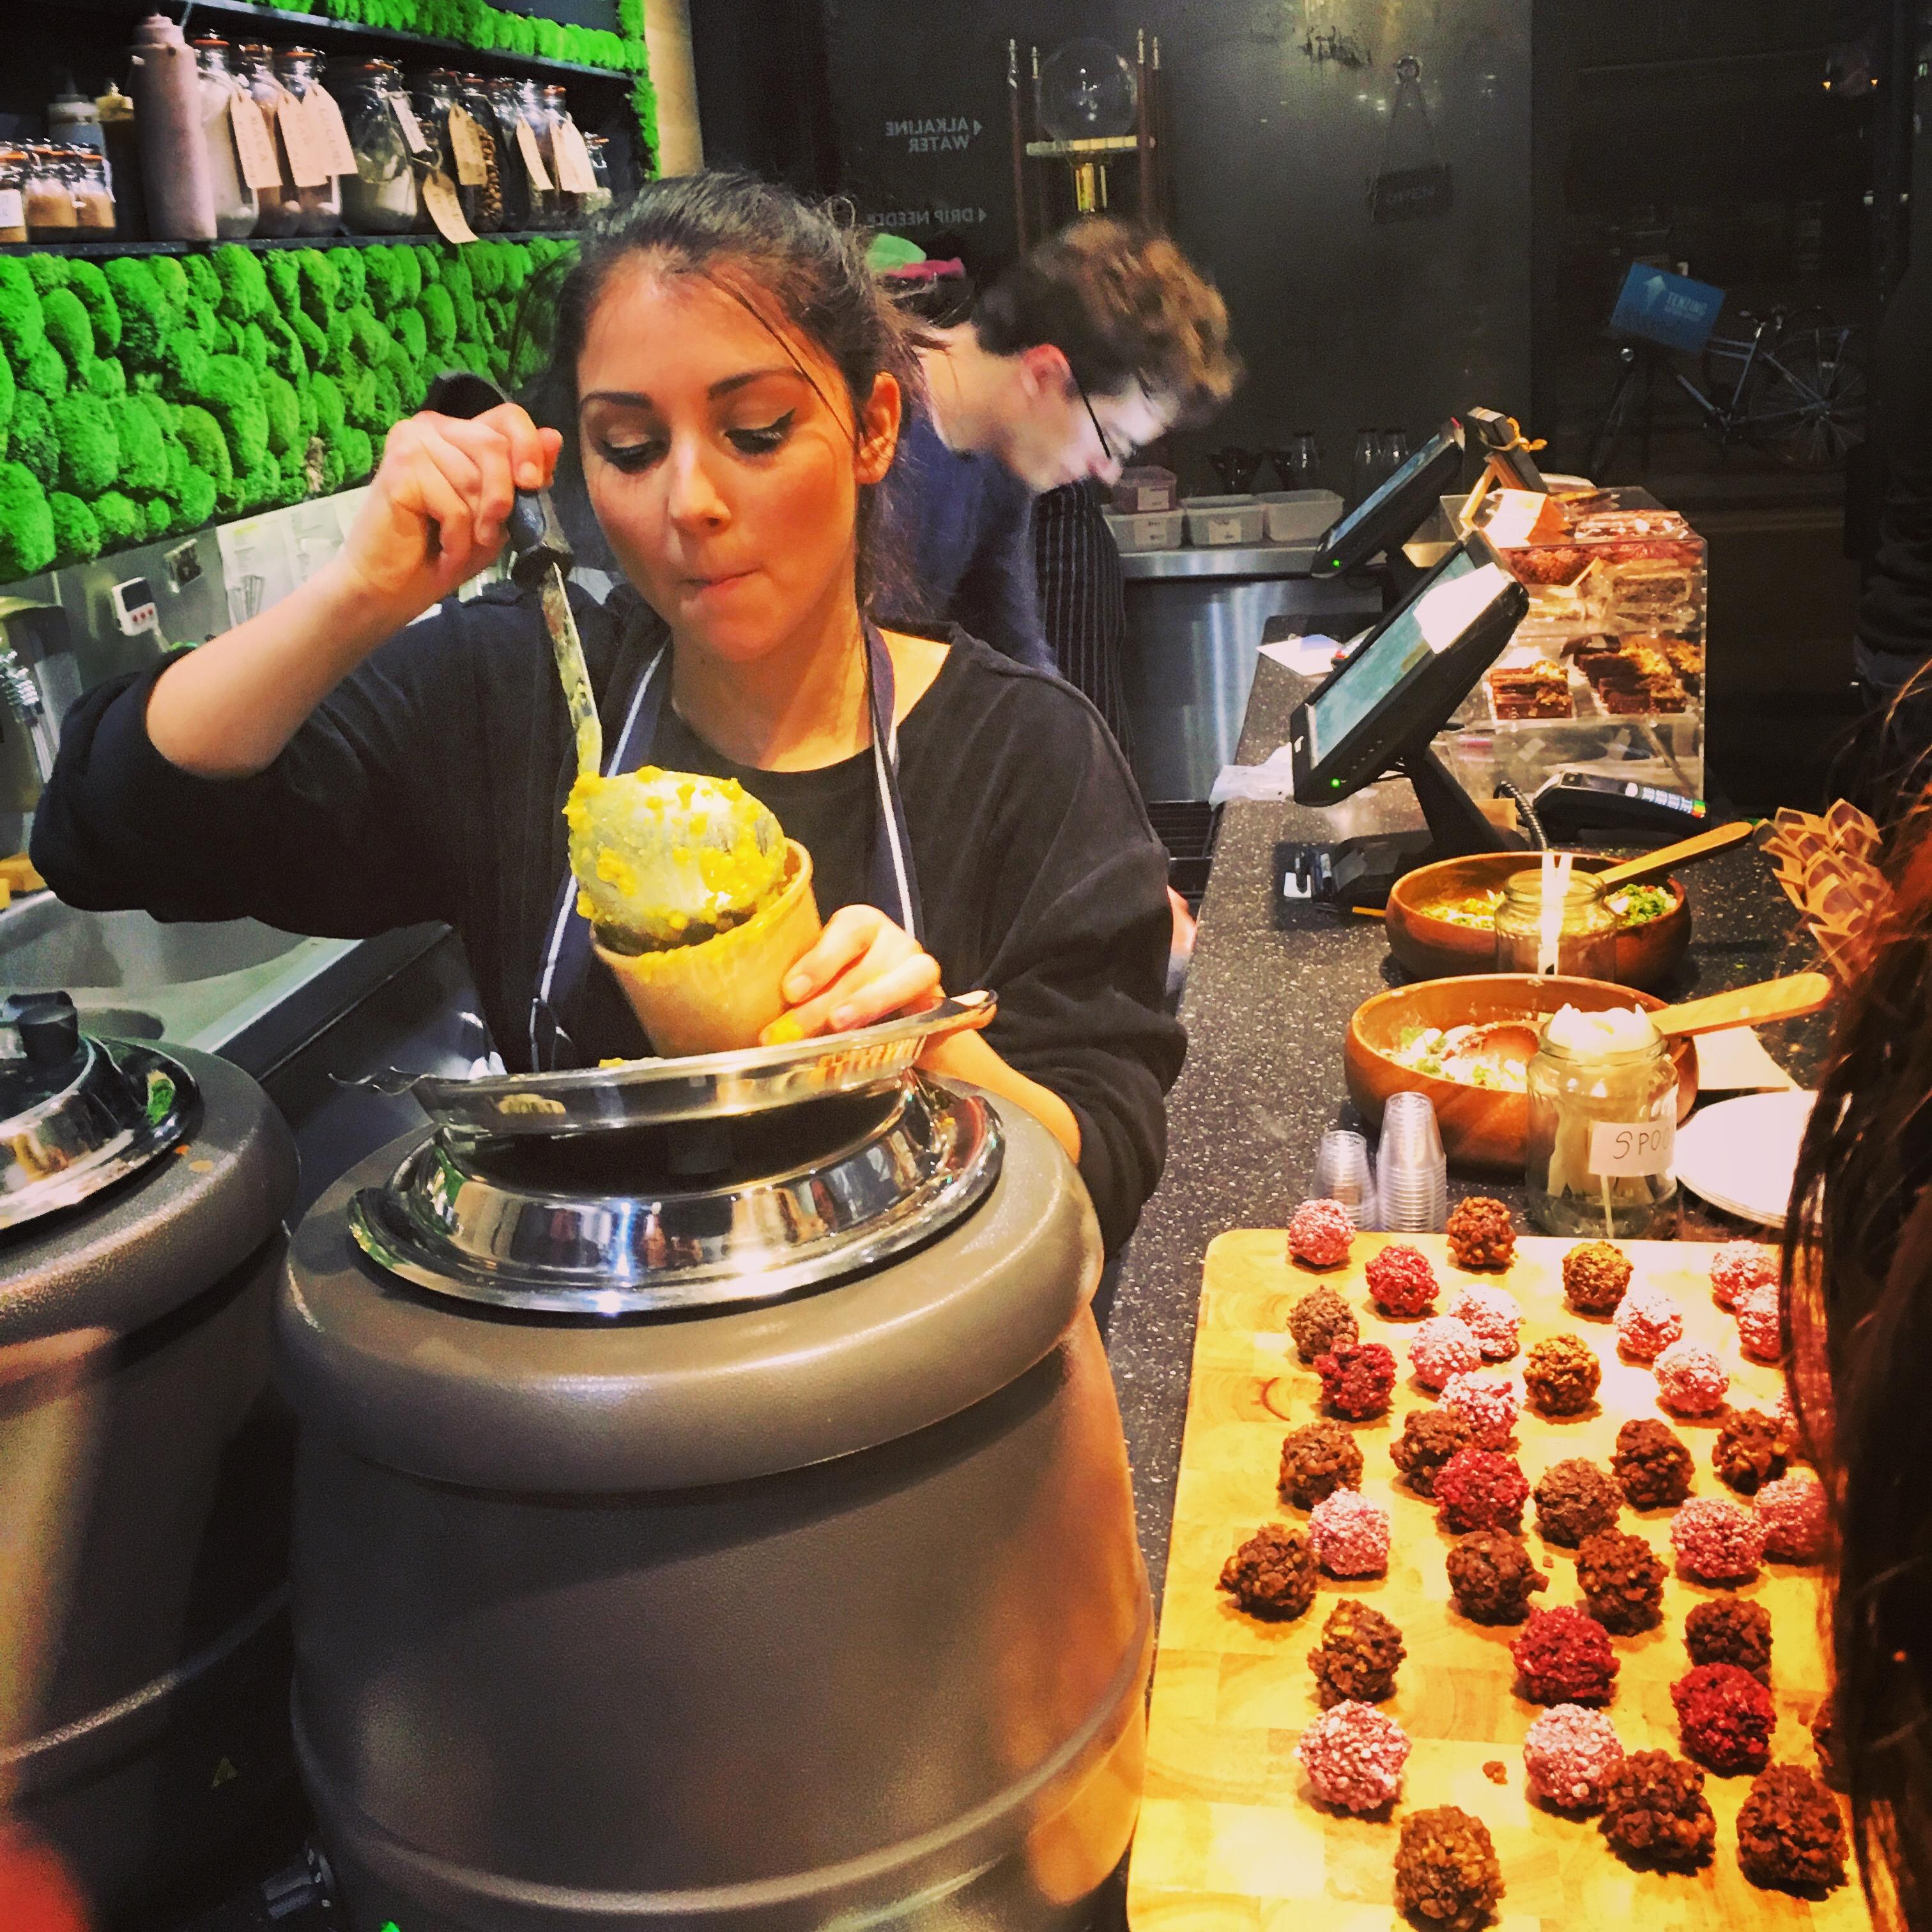 Goodge Place Food Market